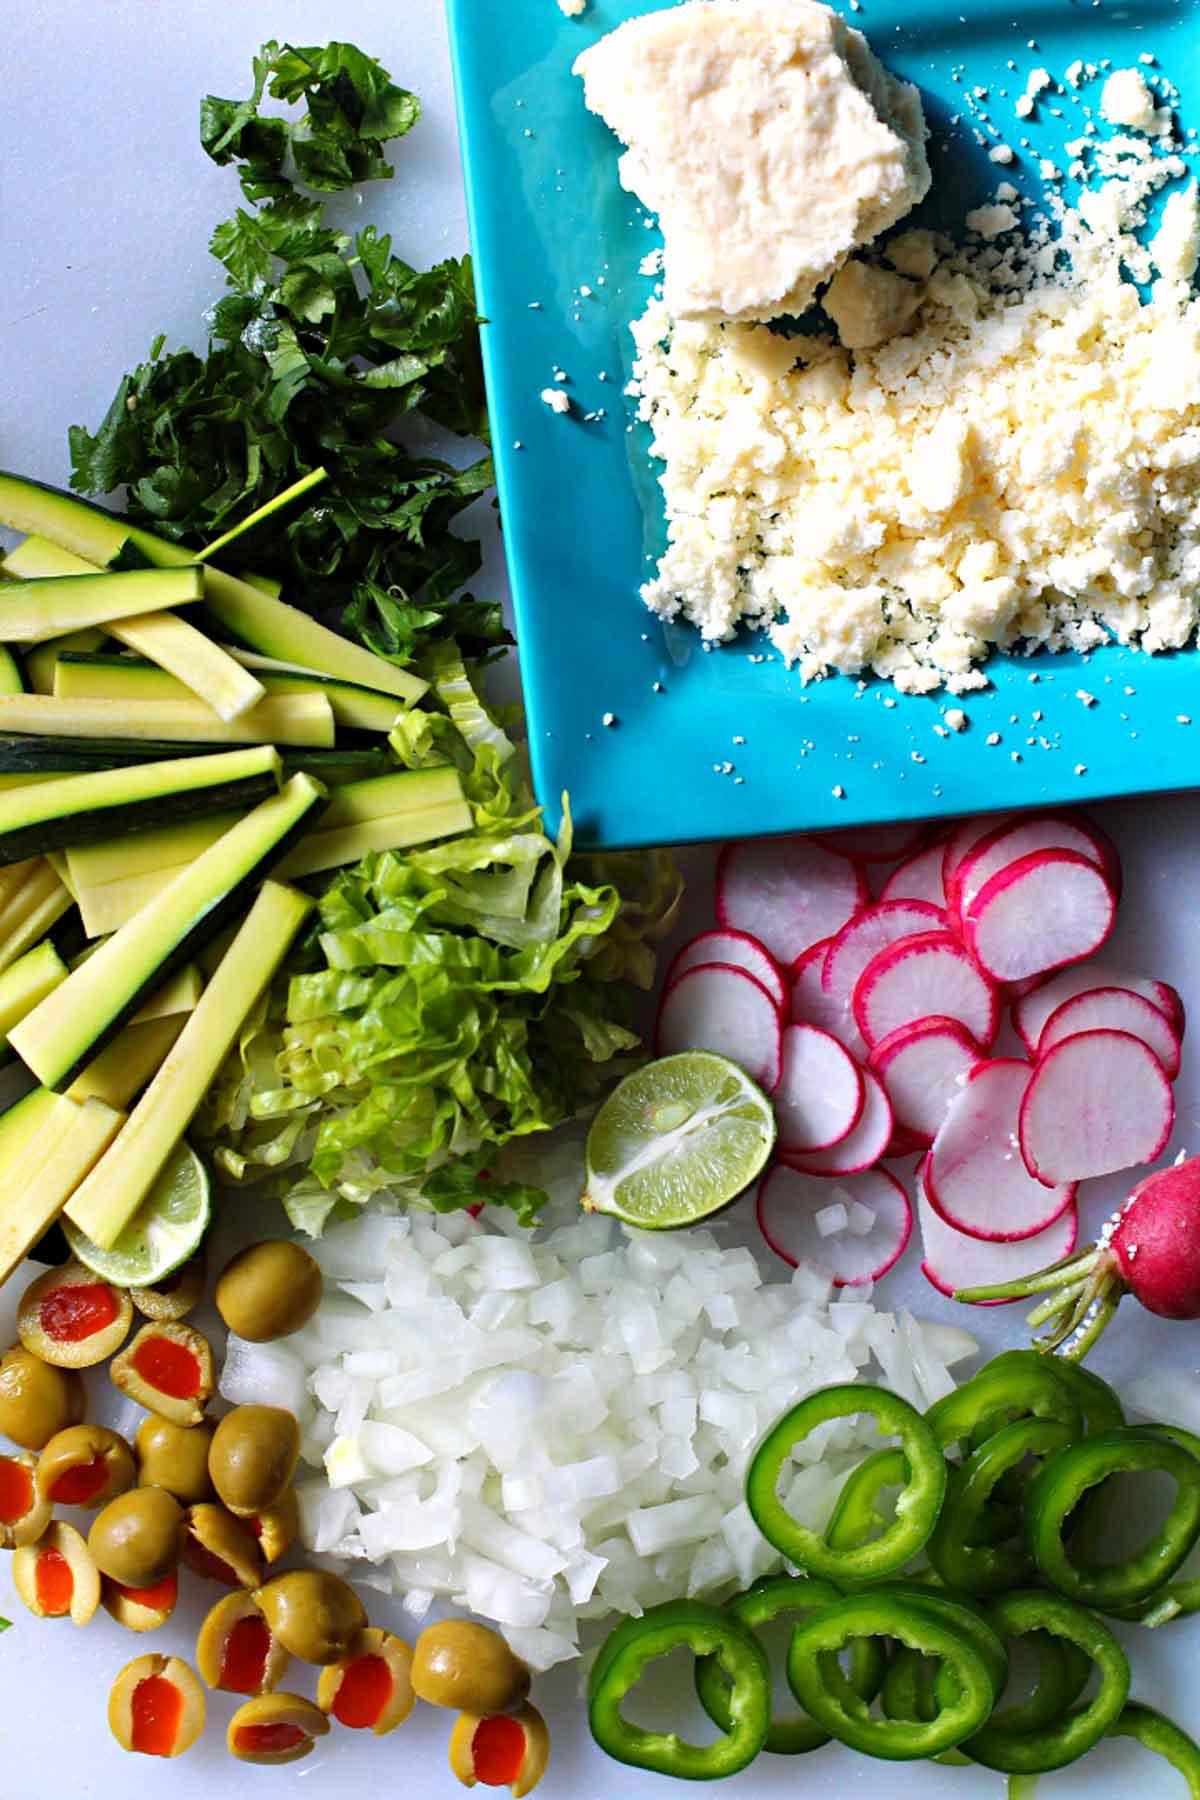 Ingrediens to make street style red chile folded enchiladas